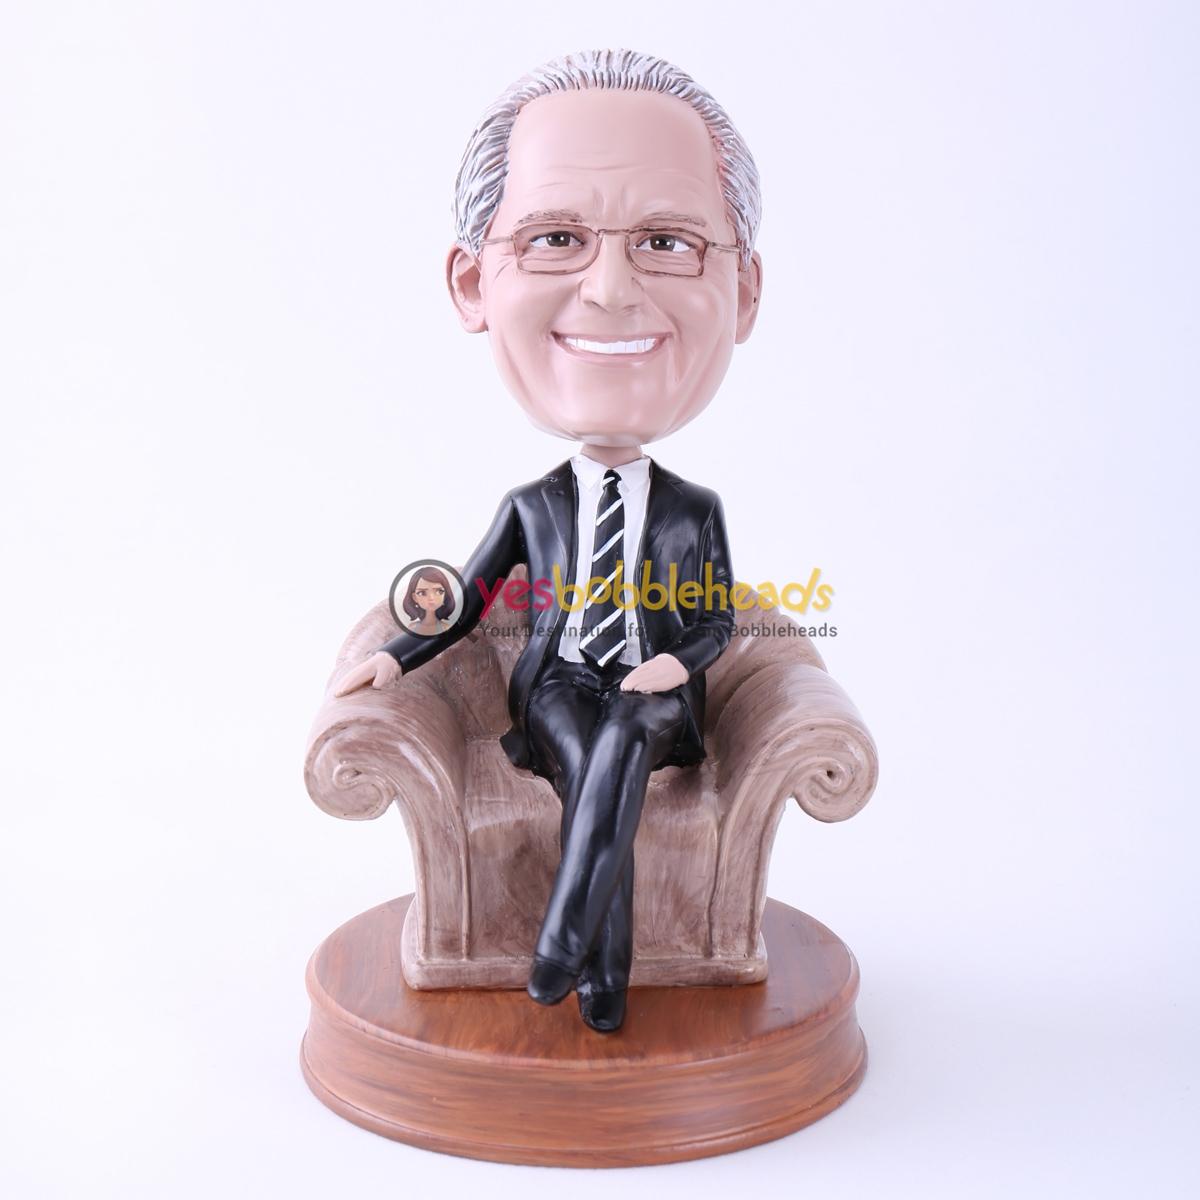 Picture of Custom Bobblehead Doll: Black Suit Man in Sofa